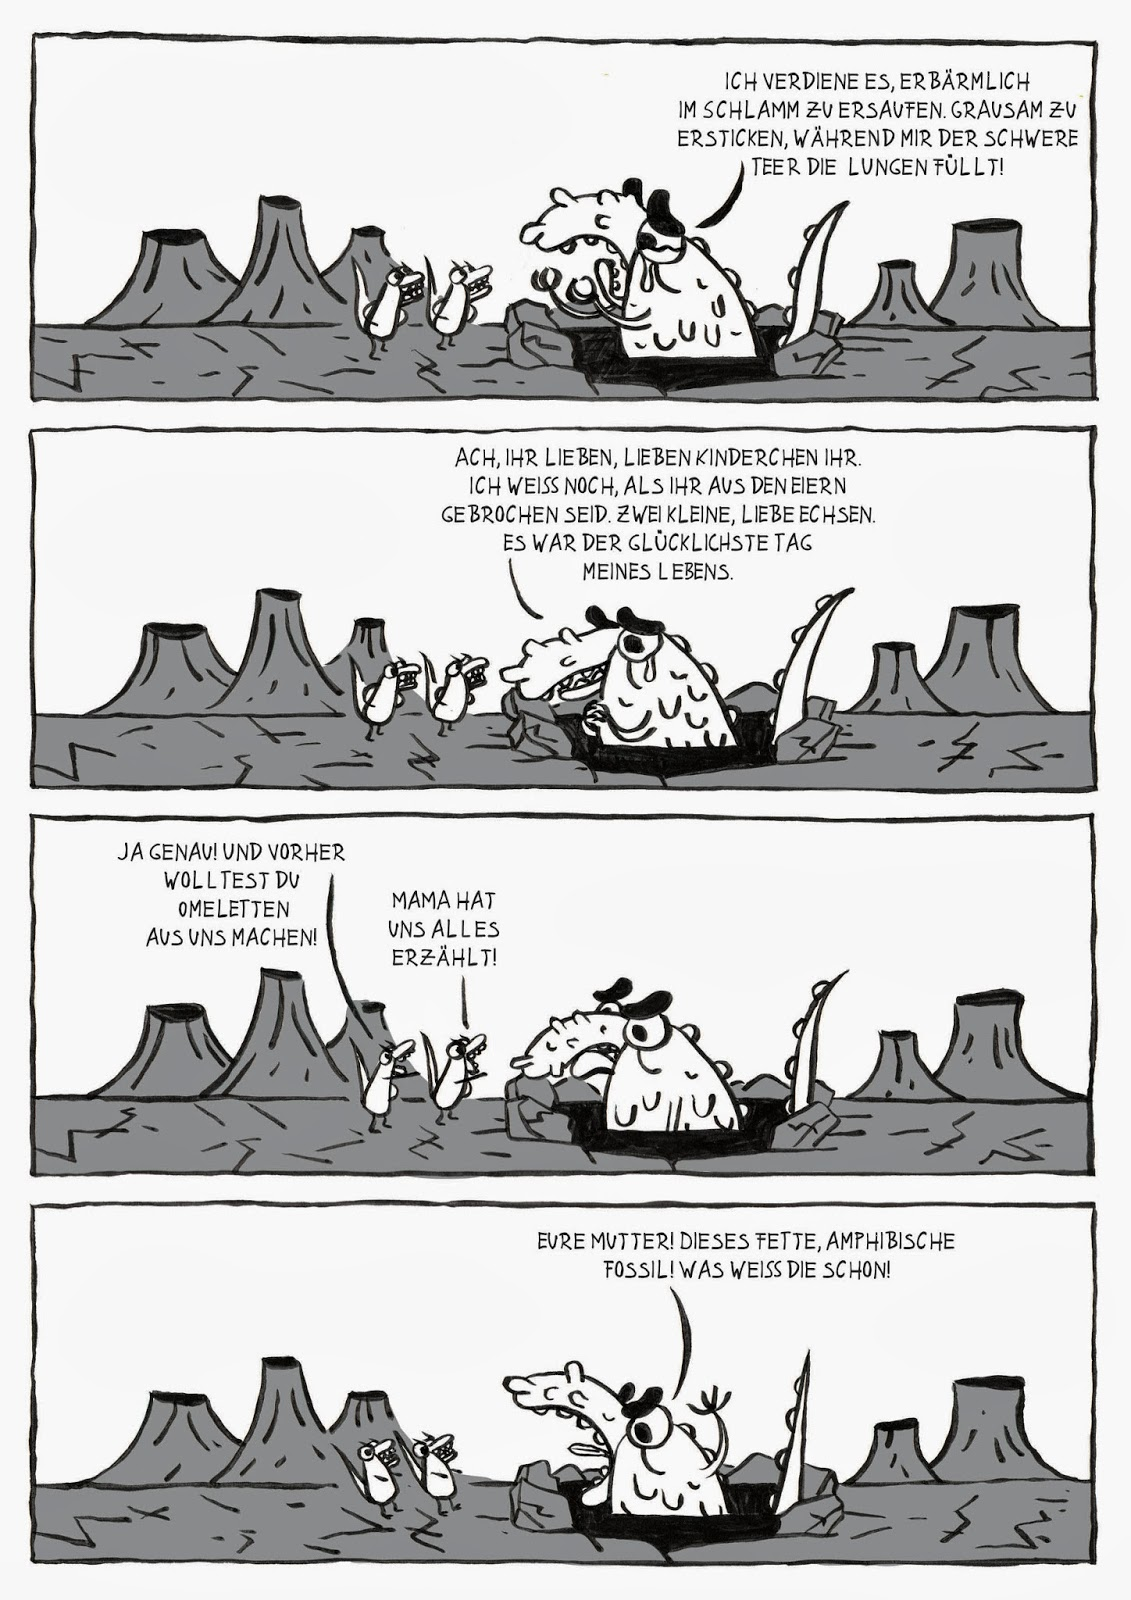 archäologie, knochen, dinosaurier, jpeg, comic